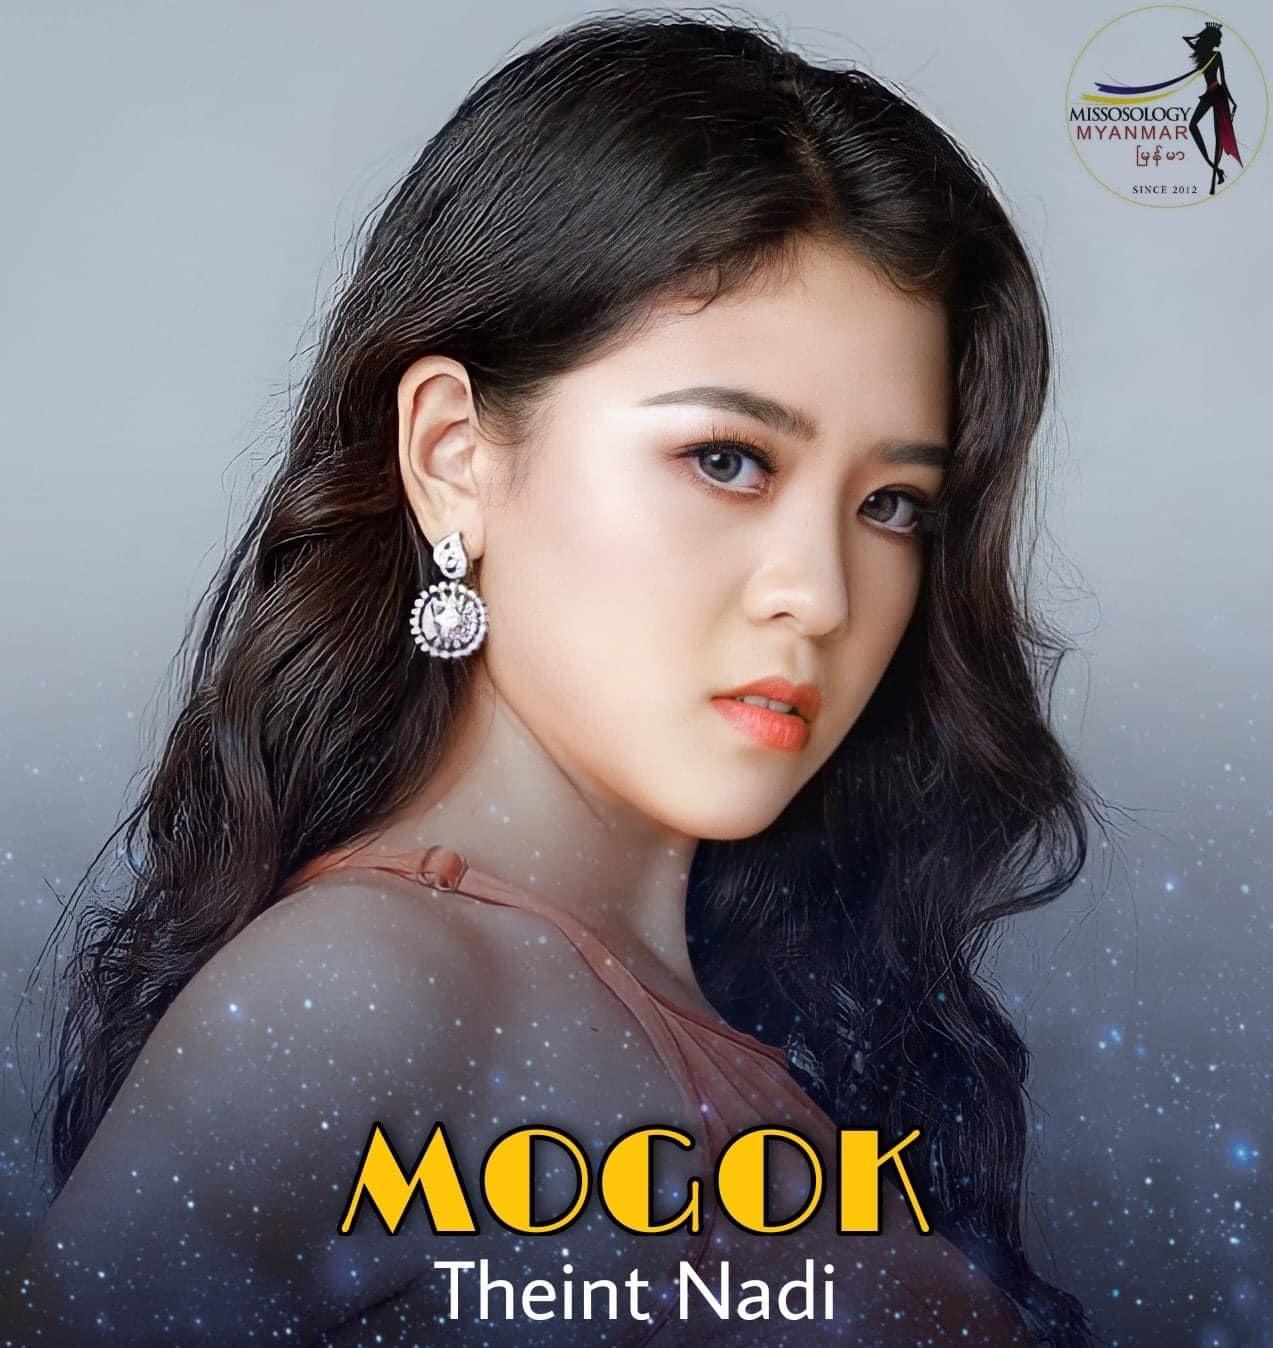 candidatas a miss universe myanmar 2020. final: 30 dec. - Página 2 131984369-4223969317619300-3159042652046271710-o